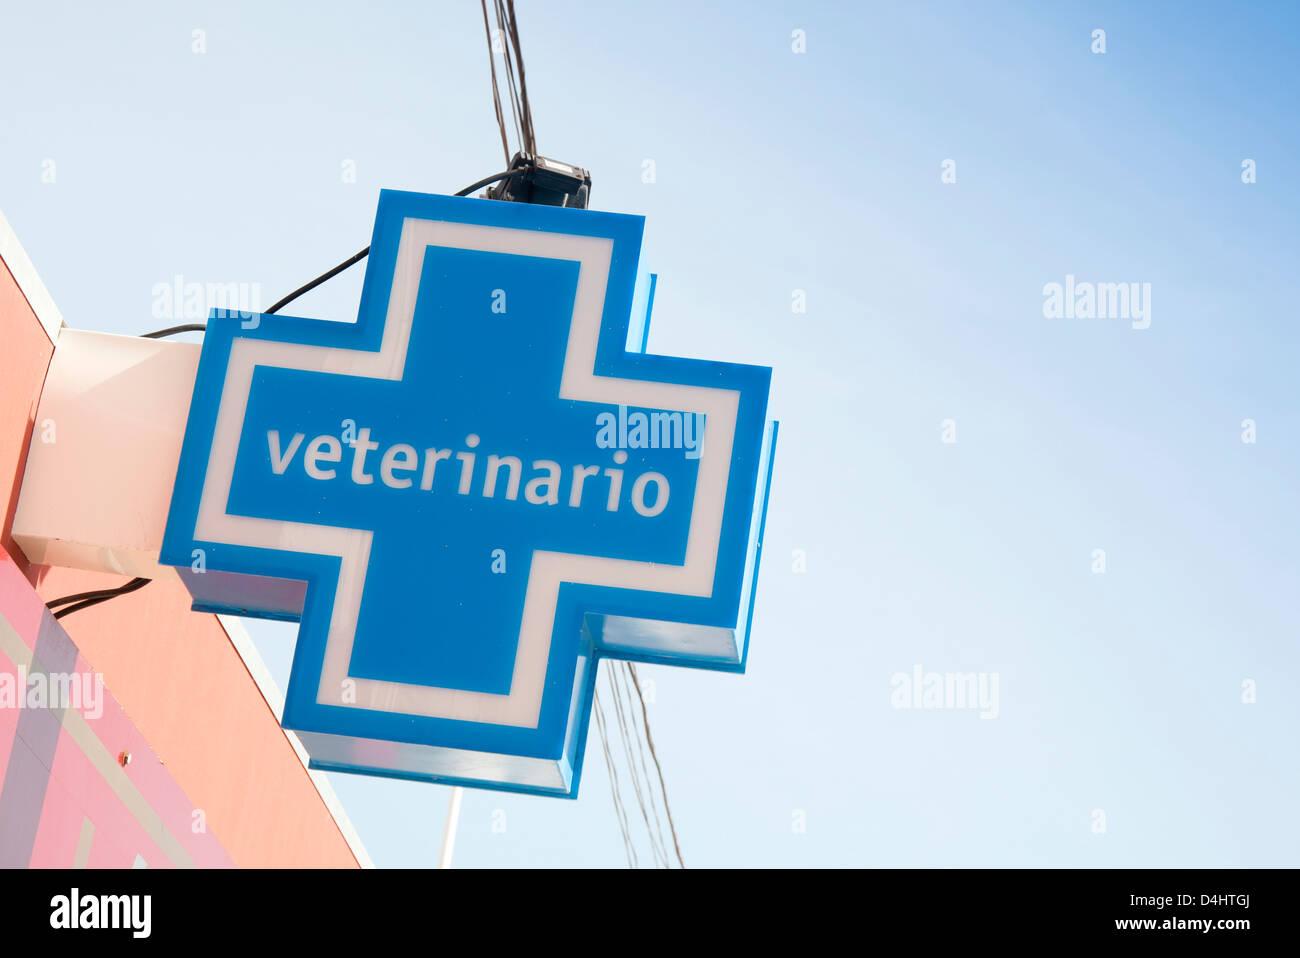 Veterinario sign Fuerteventura - Stock Image